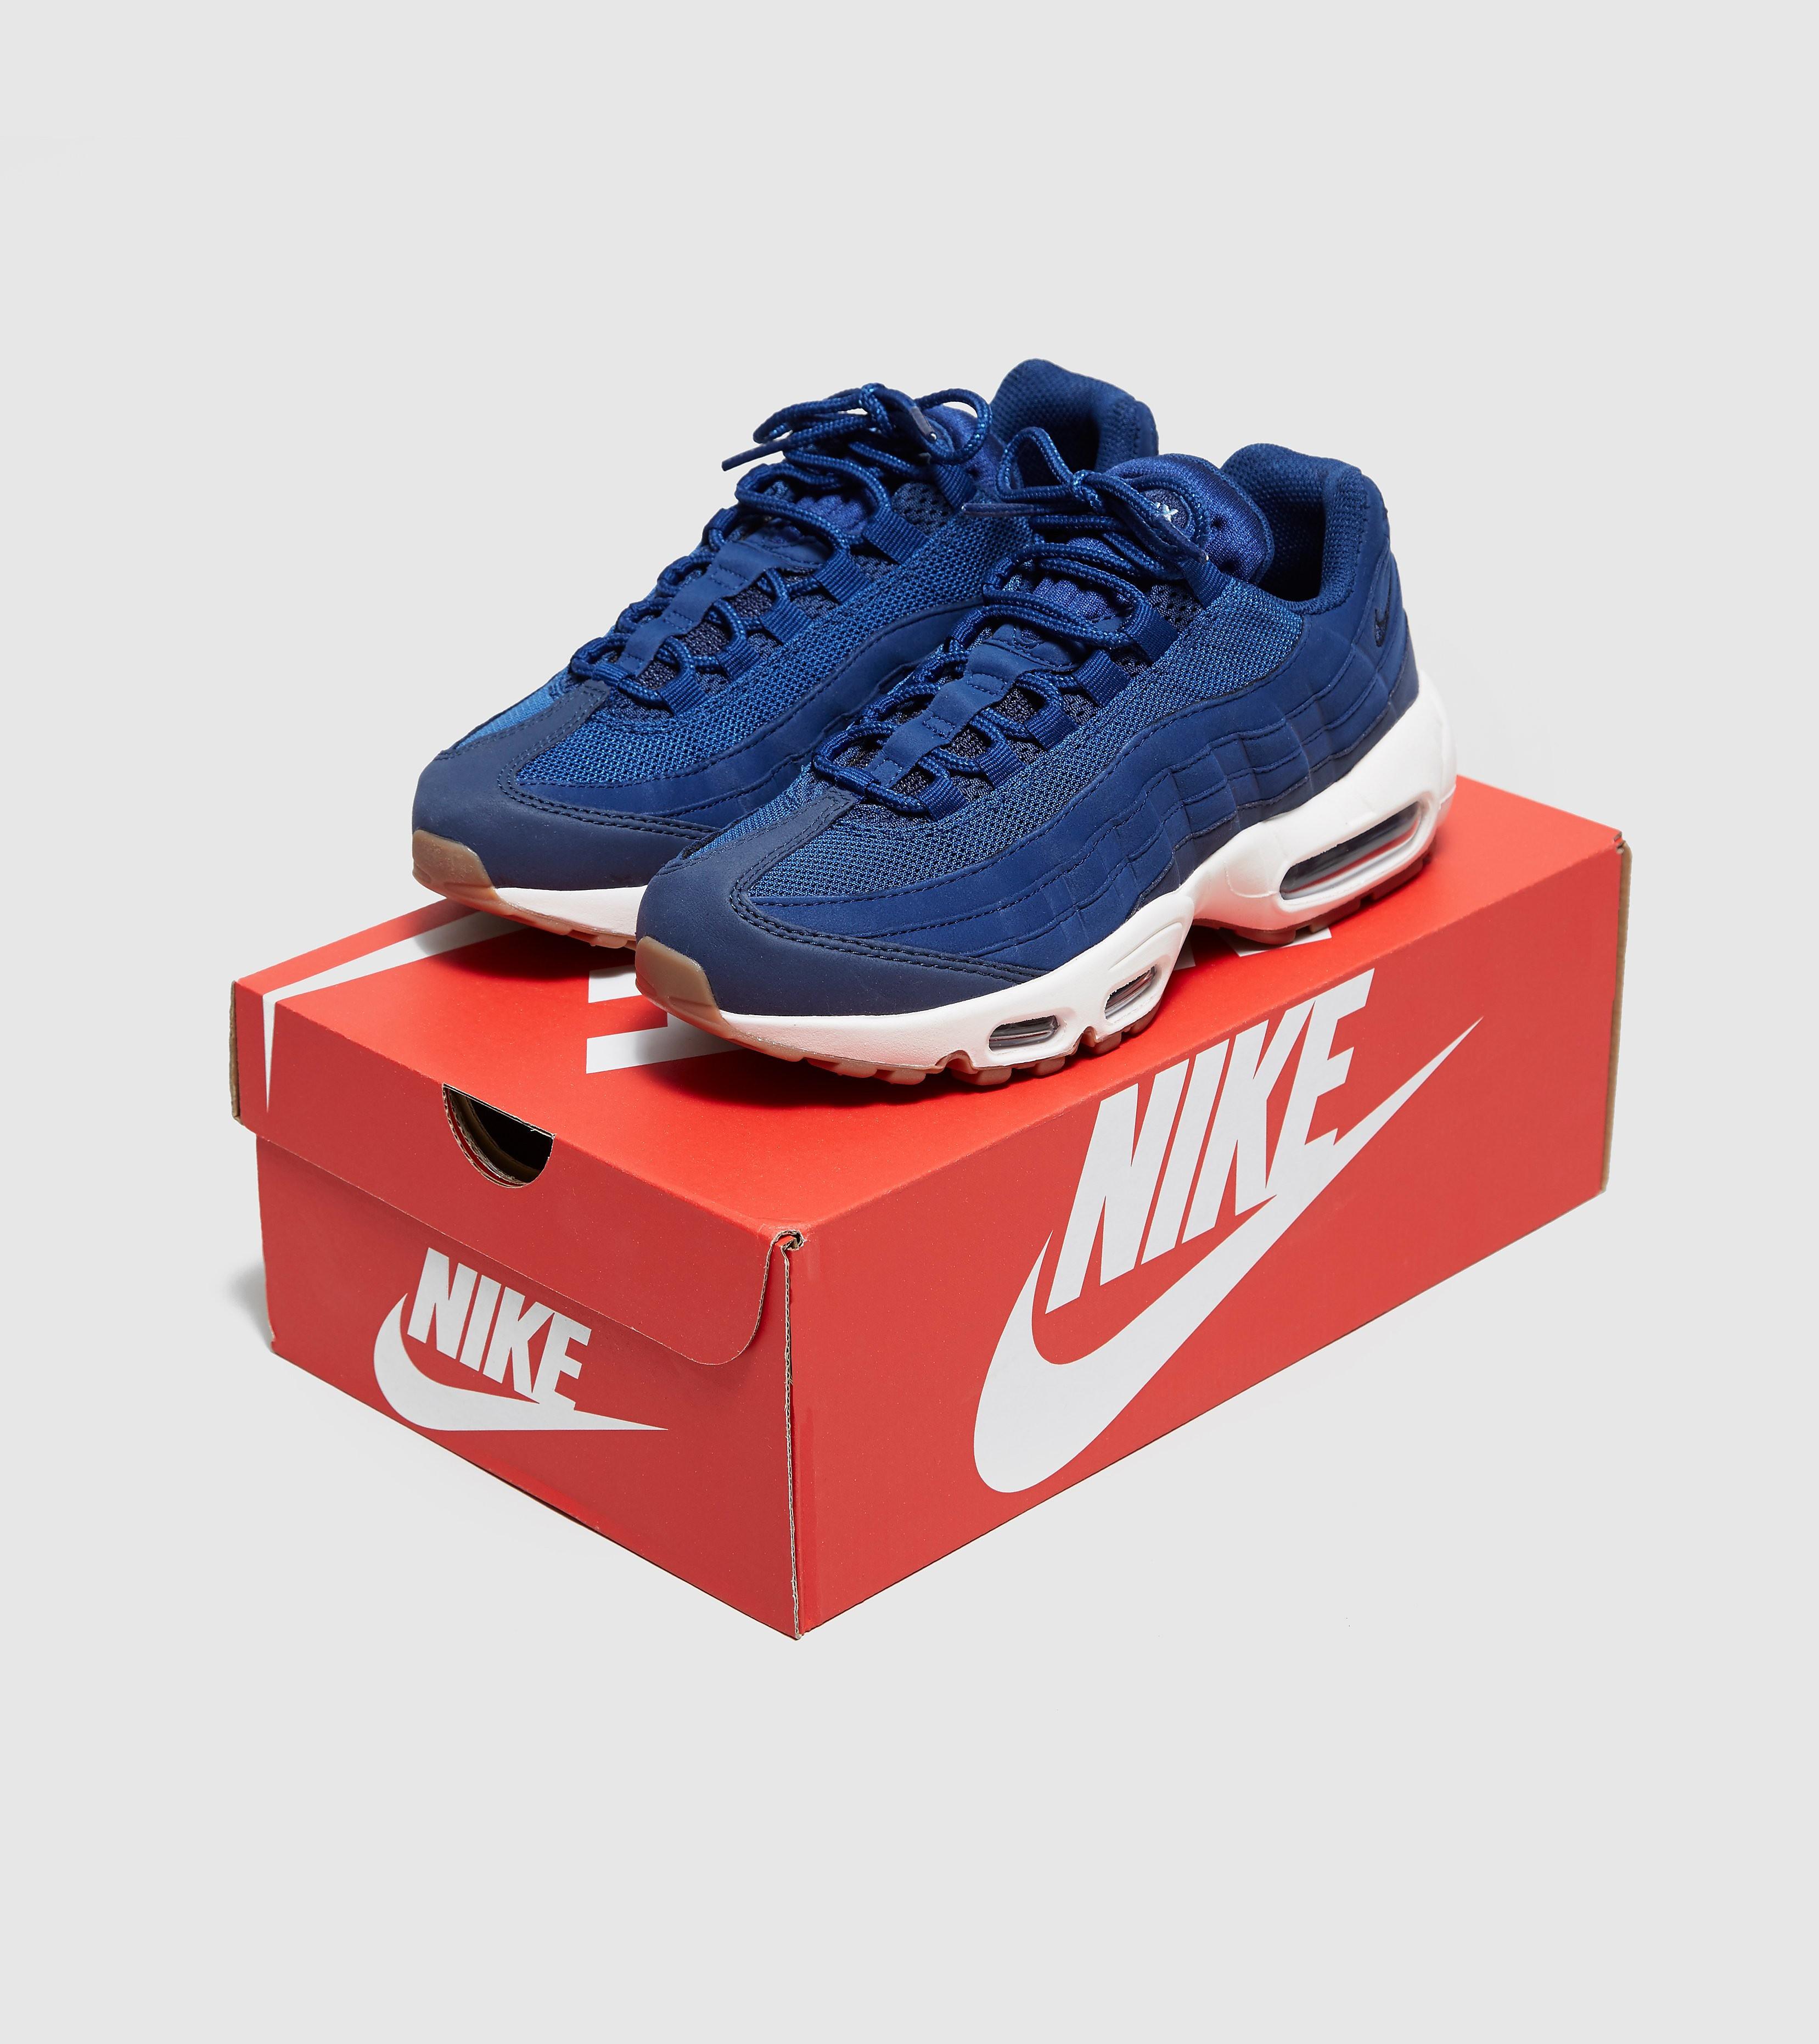 Nike Air Max 95 OG Frauen